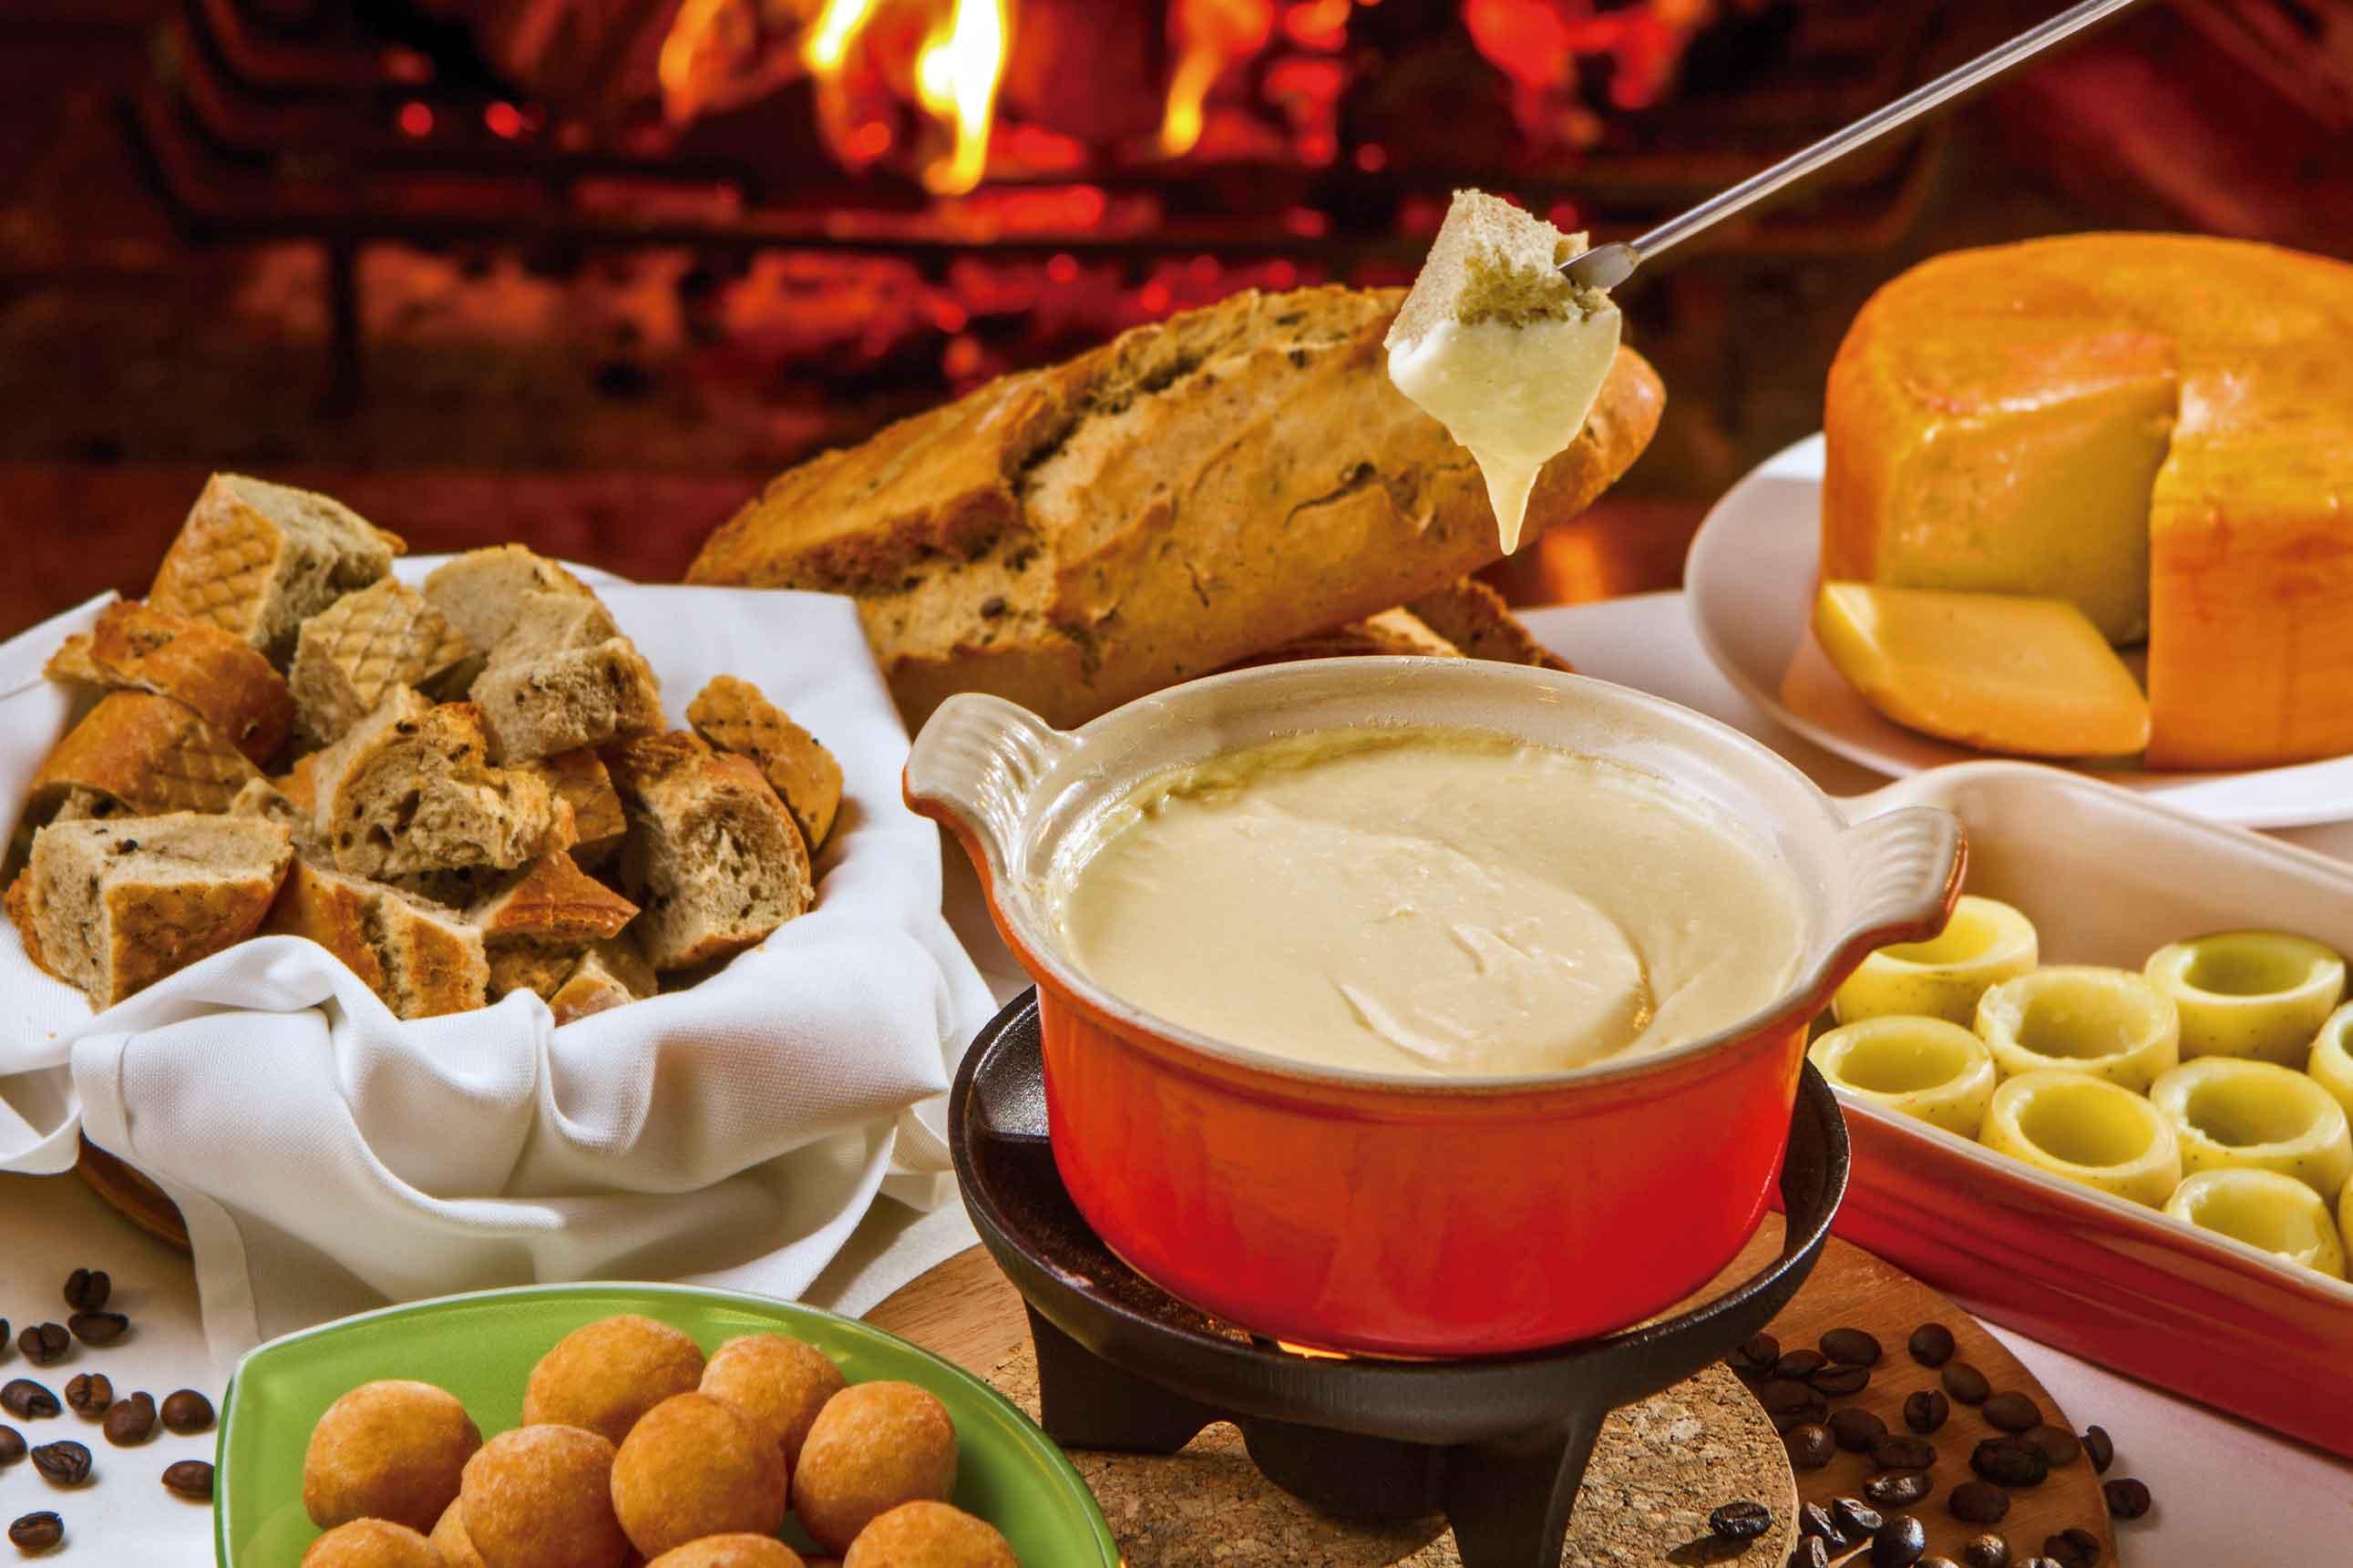 https://duhocthuysi.net/wp-content/uploads/2018/11/Campos-do-Jordao-Gastronomia-Restaurante-Charpentier-Fondue-bx.jpg